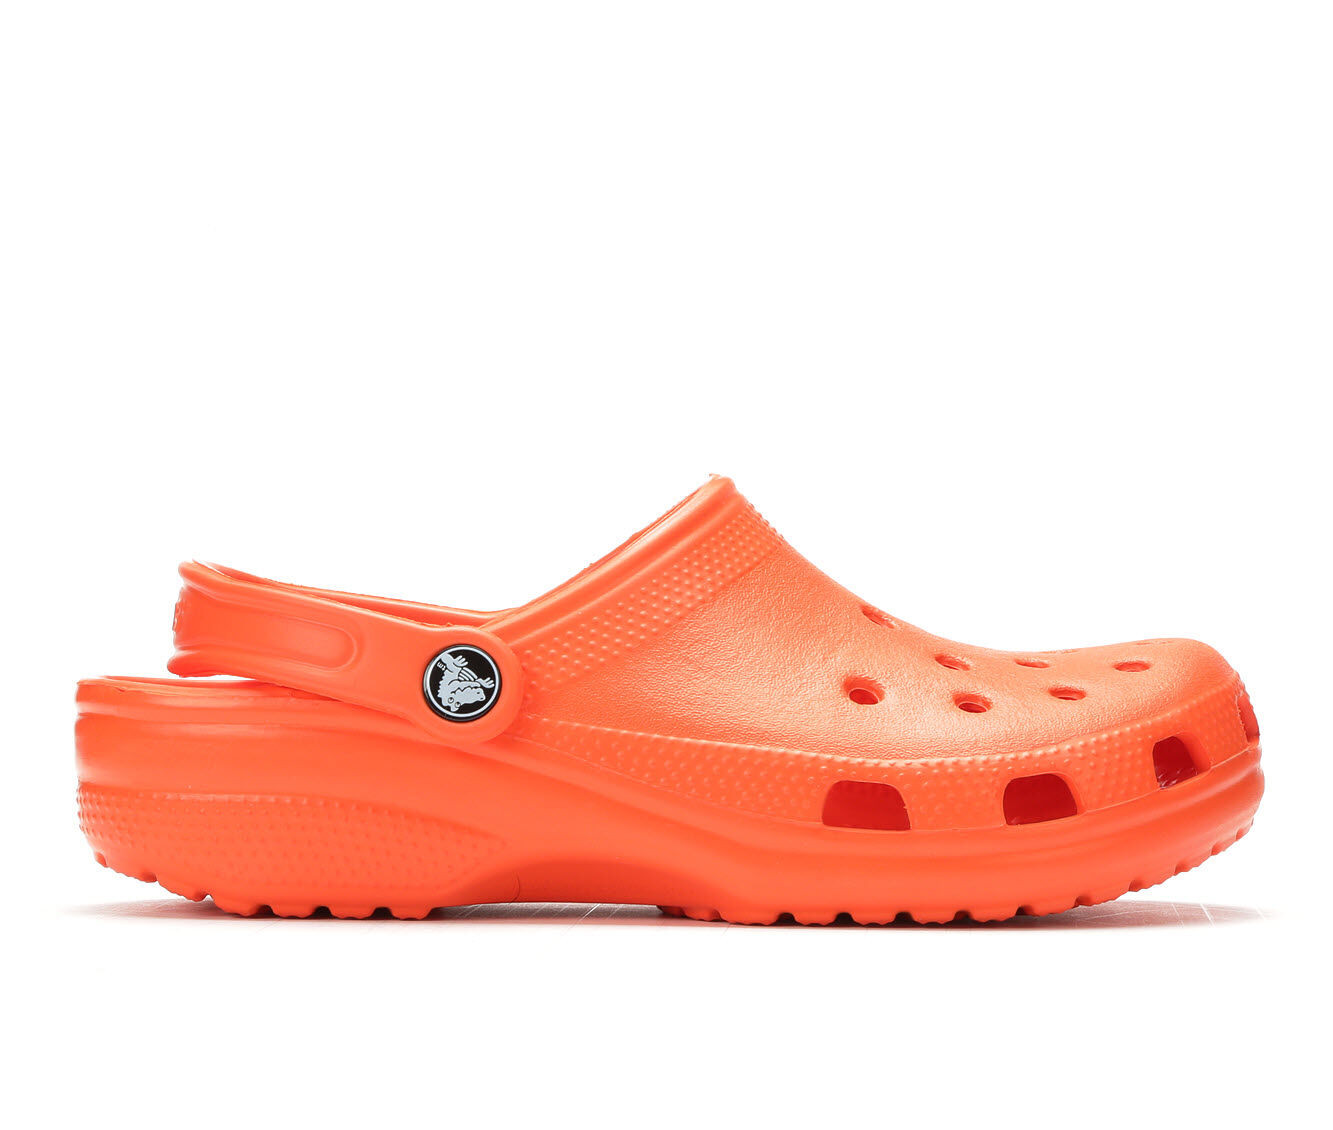 Women's Crocs Classic Clogs Tangerine